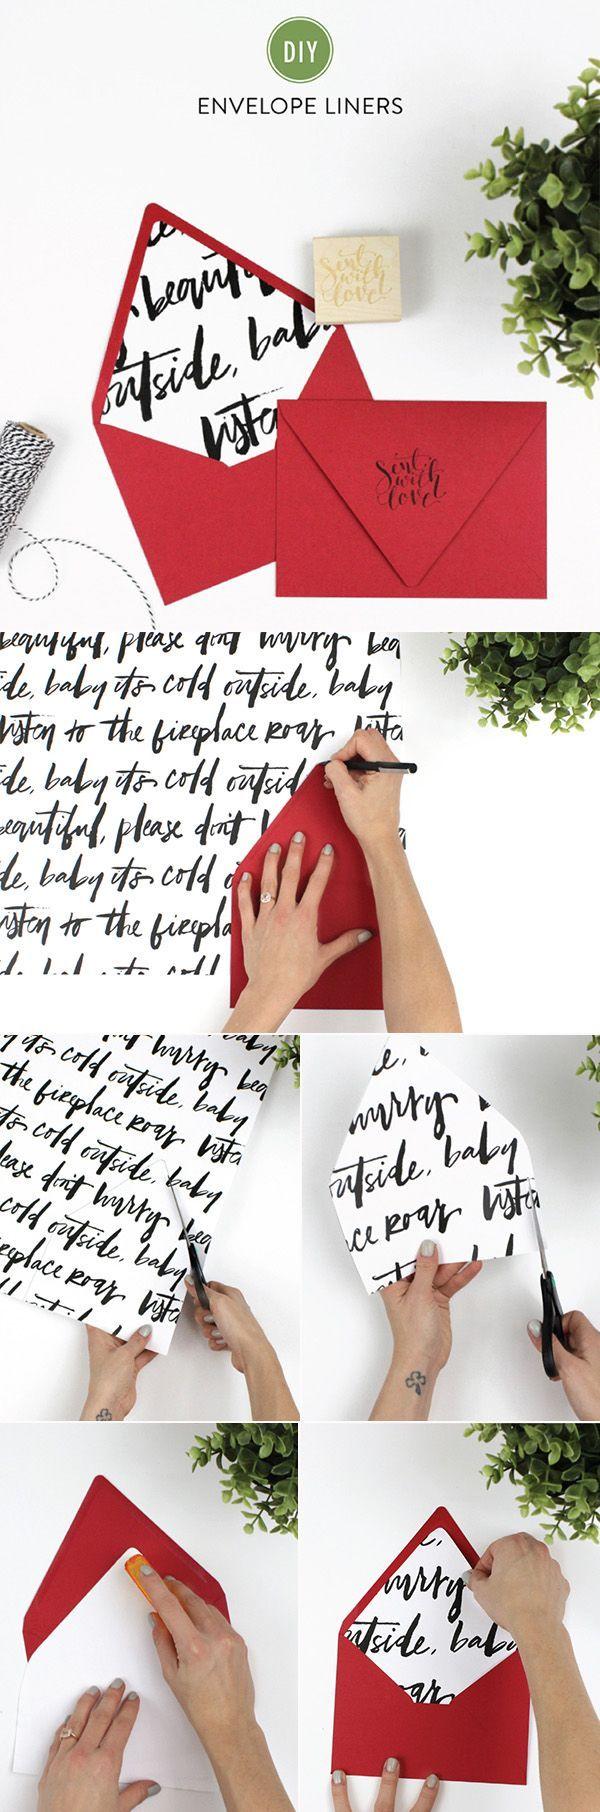 221 best DIY Wedding Ideas images on Pinterest | Wedding ideas ...